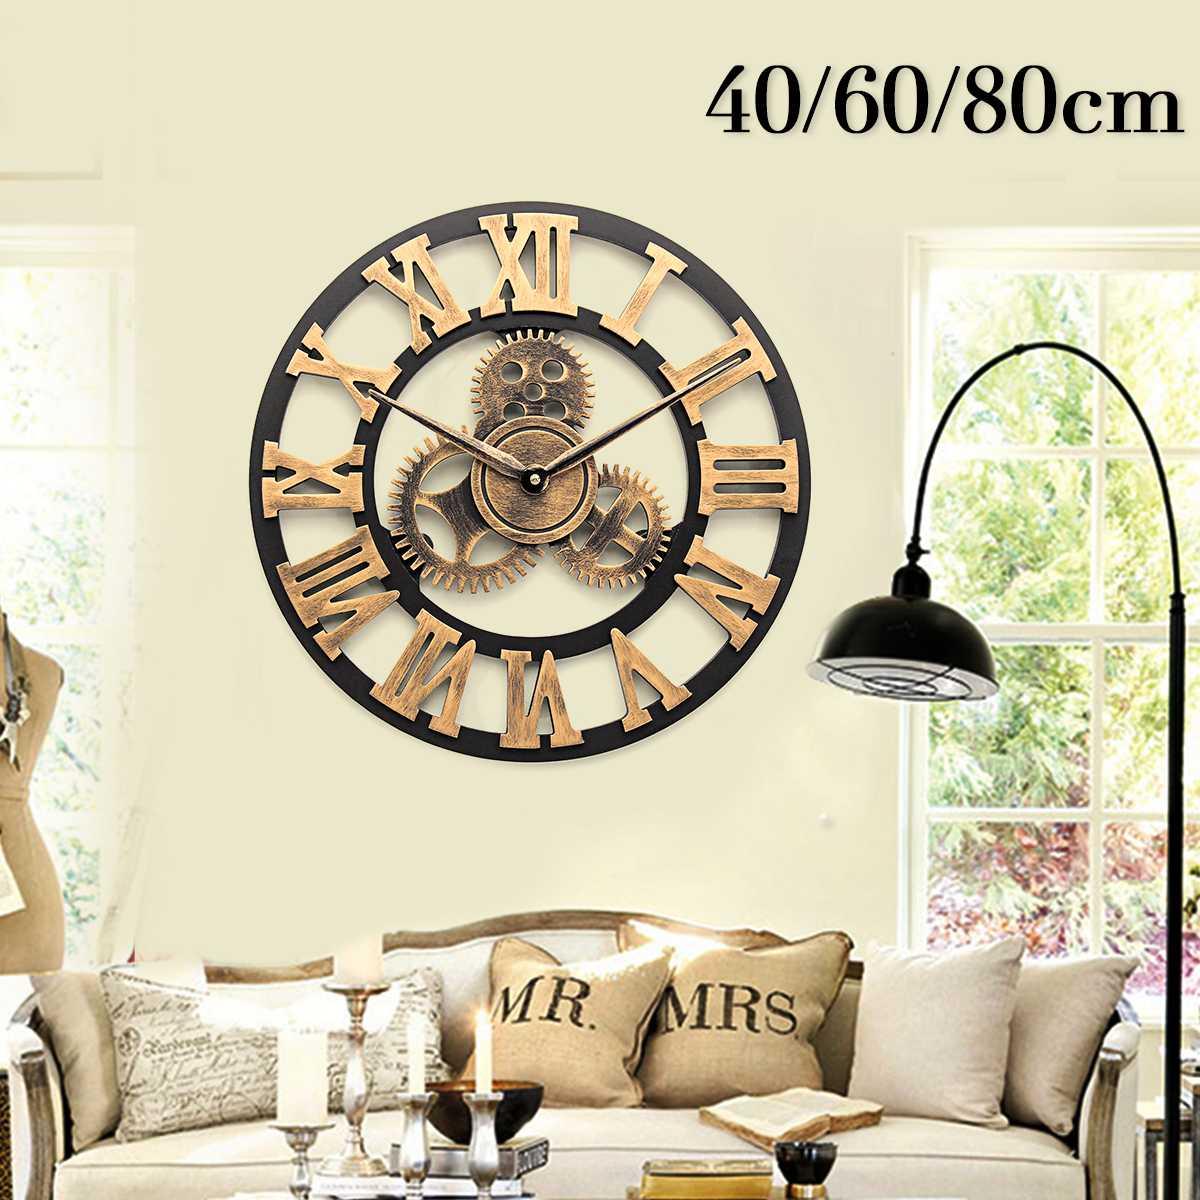 40/60/80cm Retro Vintage Handmade Large Wall Clock Luxury 3D Handmade Wooden Wall Hanging Clock Living Room Decoration Gift Wall Clocks     - title=